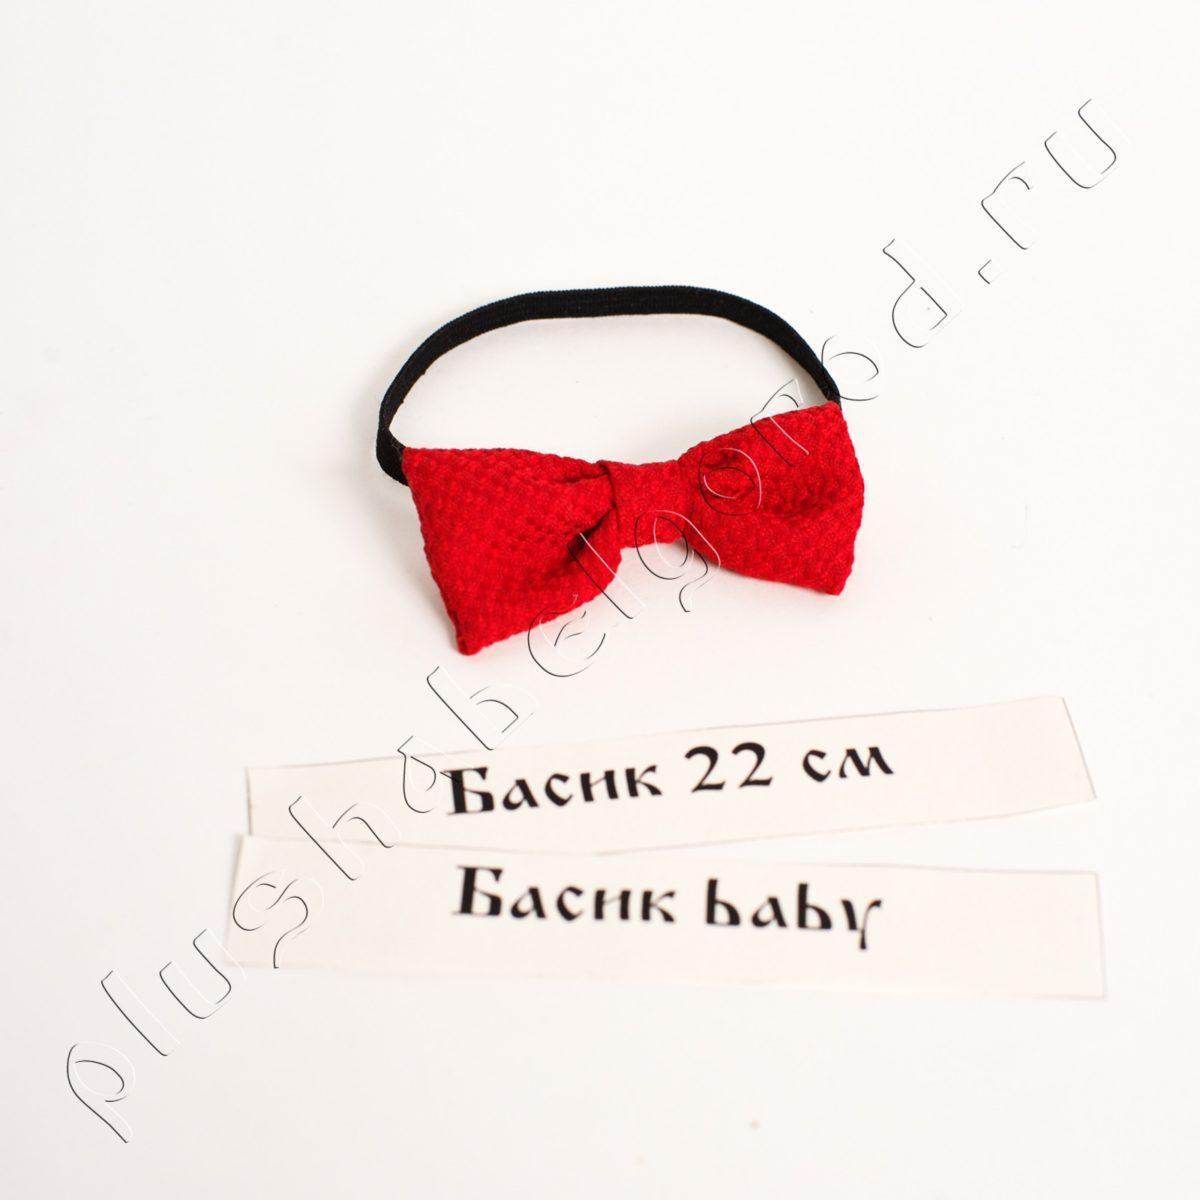 Бабочка красная для Басика baby и 22 см